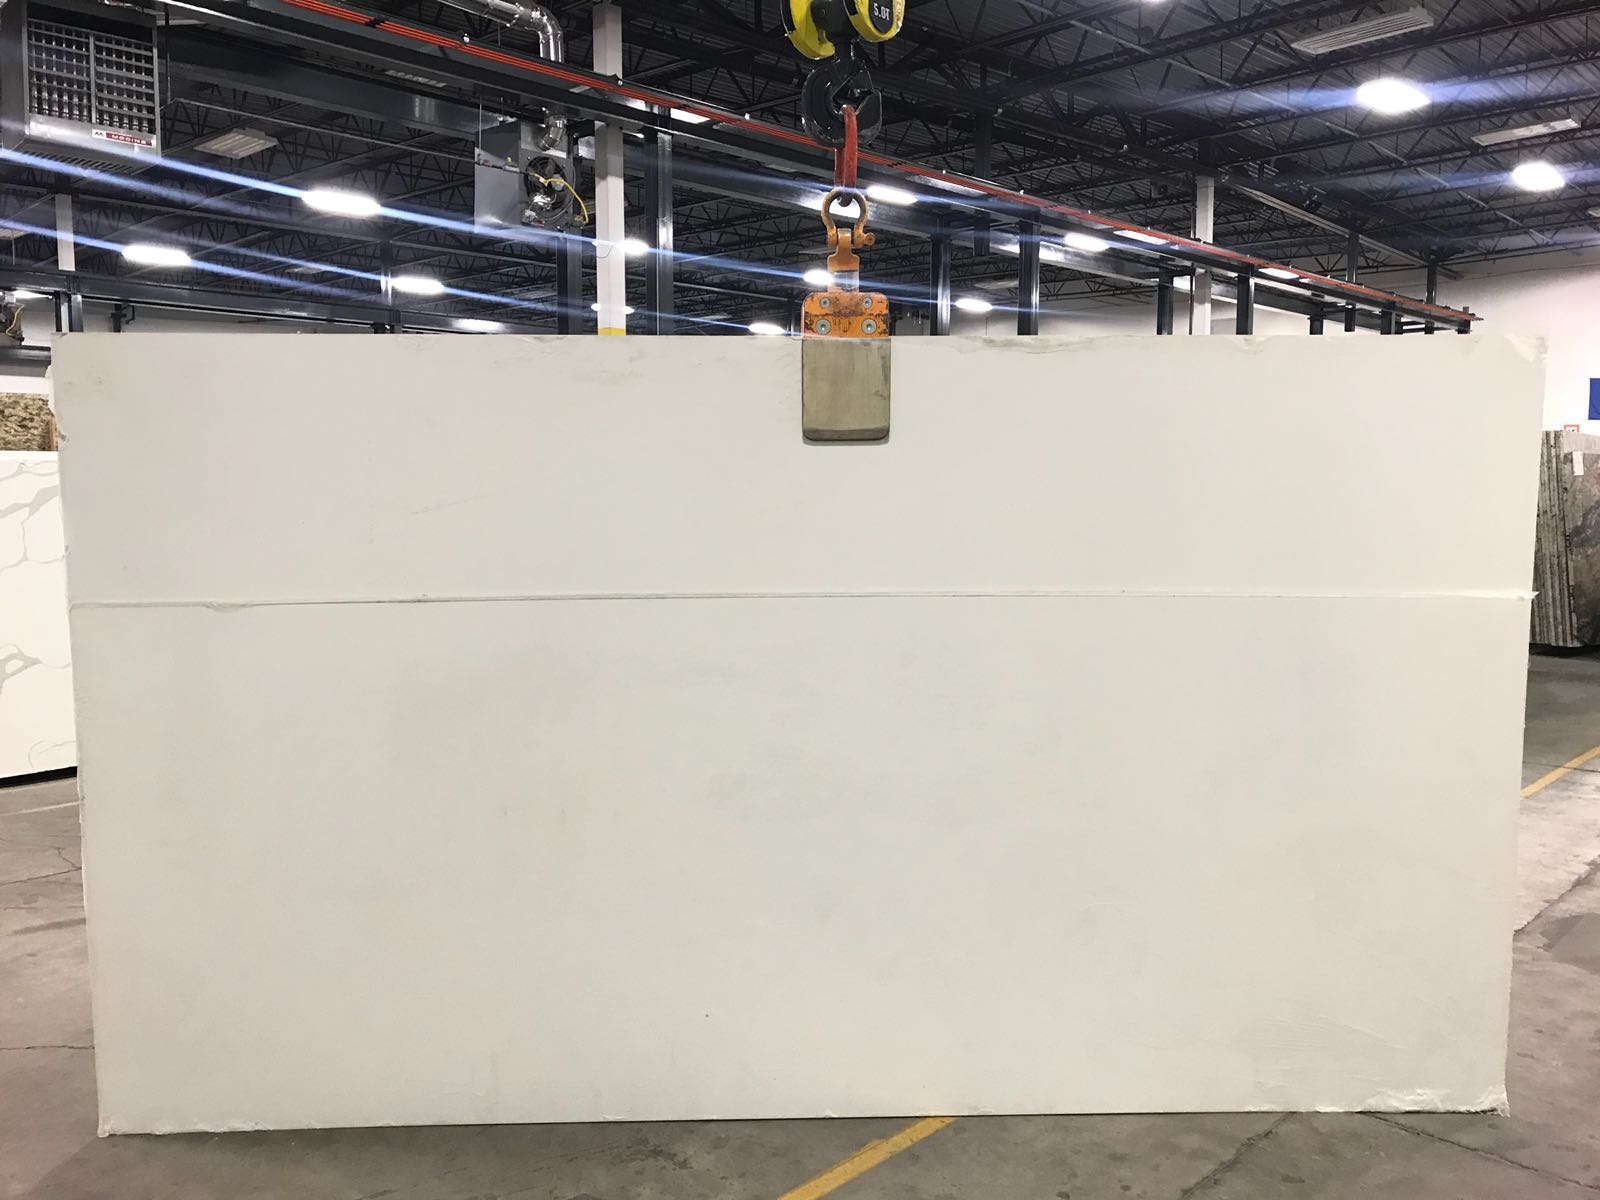 Absolute White Super Jumbo Quartz Slab 30Mm